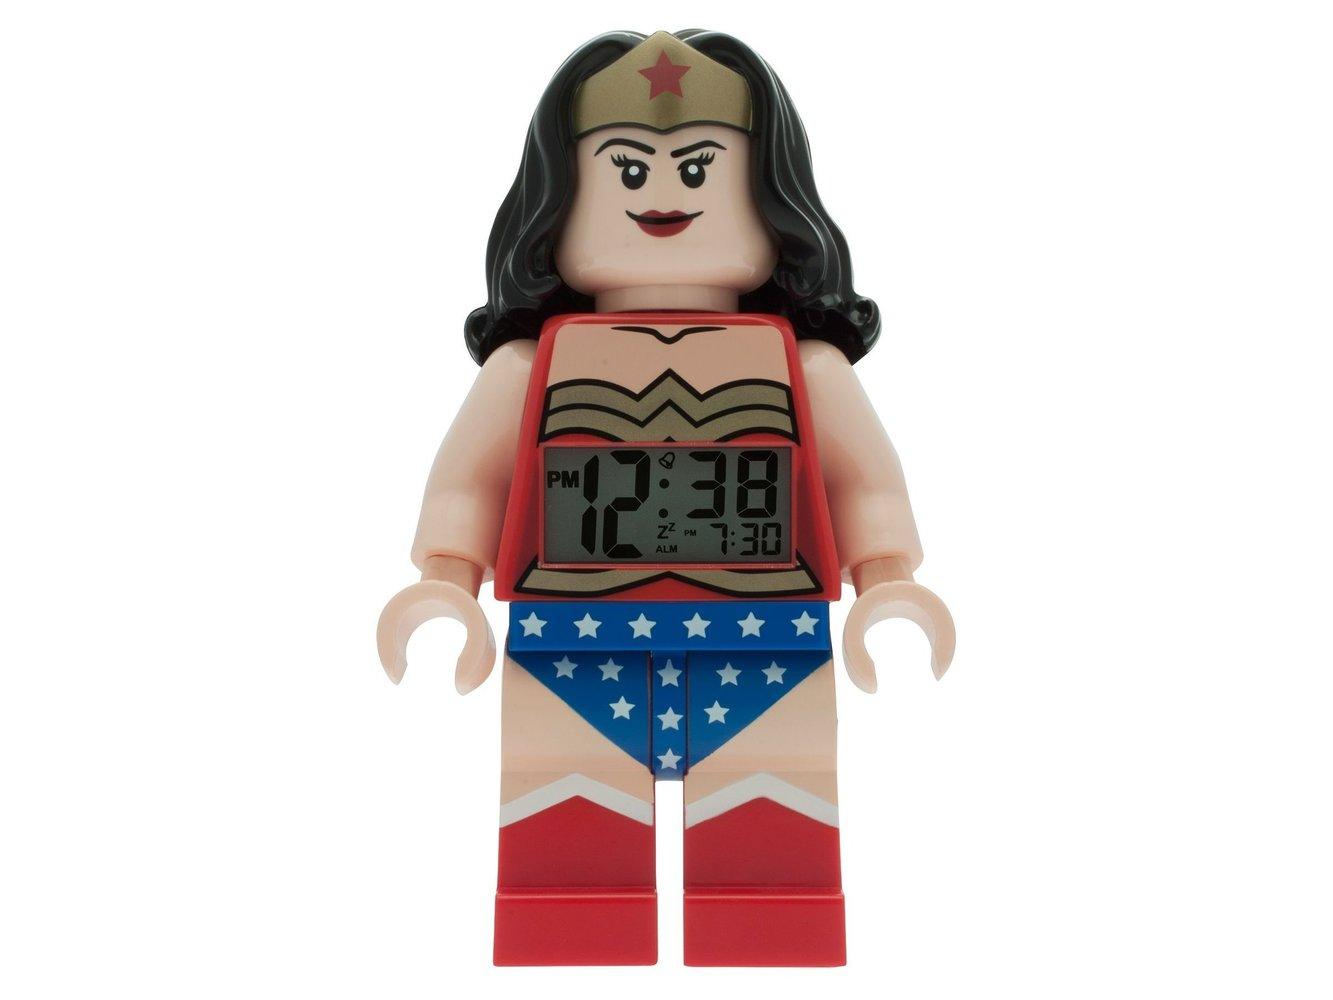 Wonder Woman Minifigure Alarm